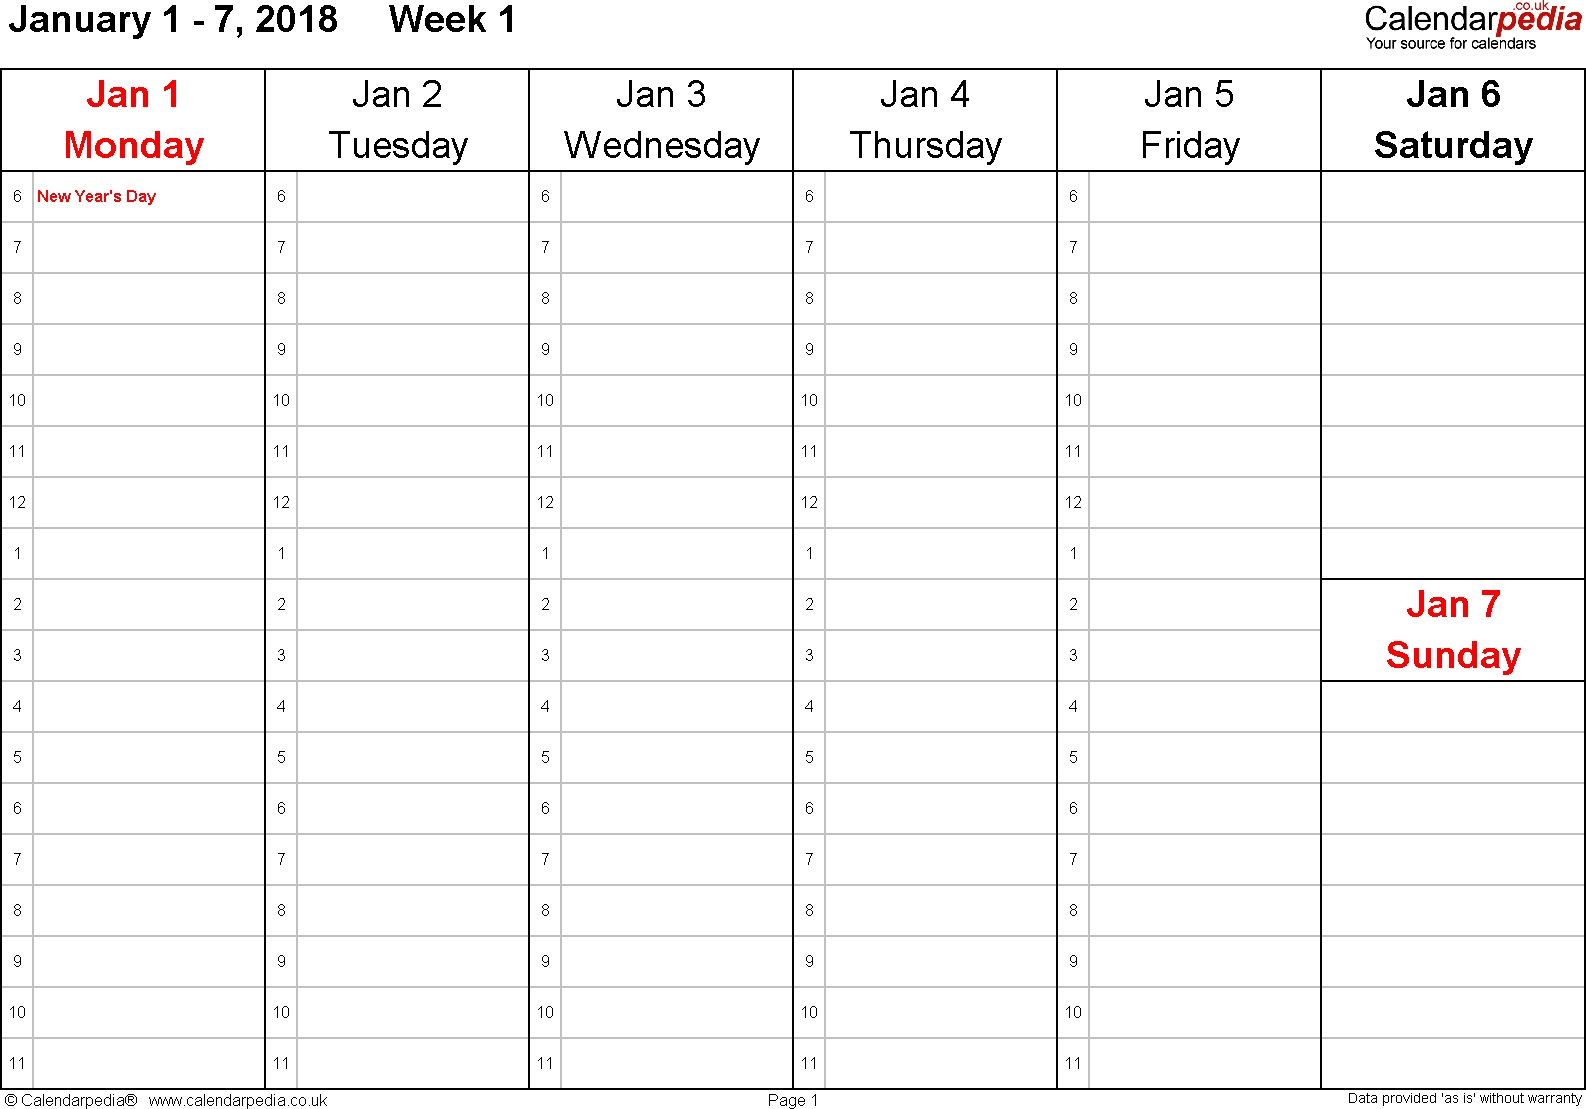 Weekly Calendar 2018 Uk - Free Printable Templates For Word